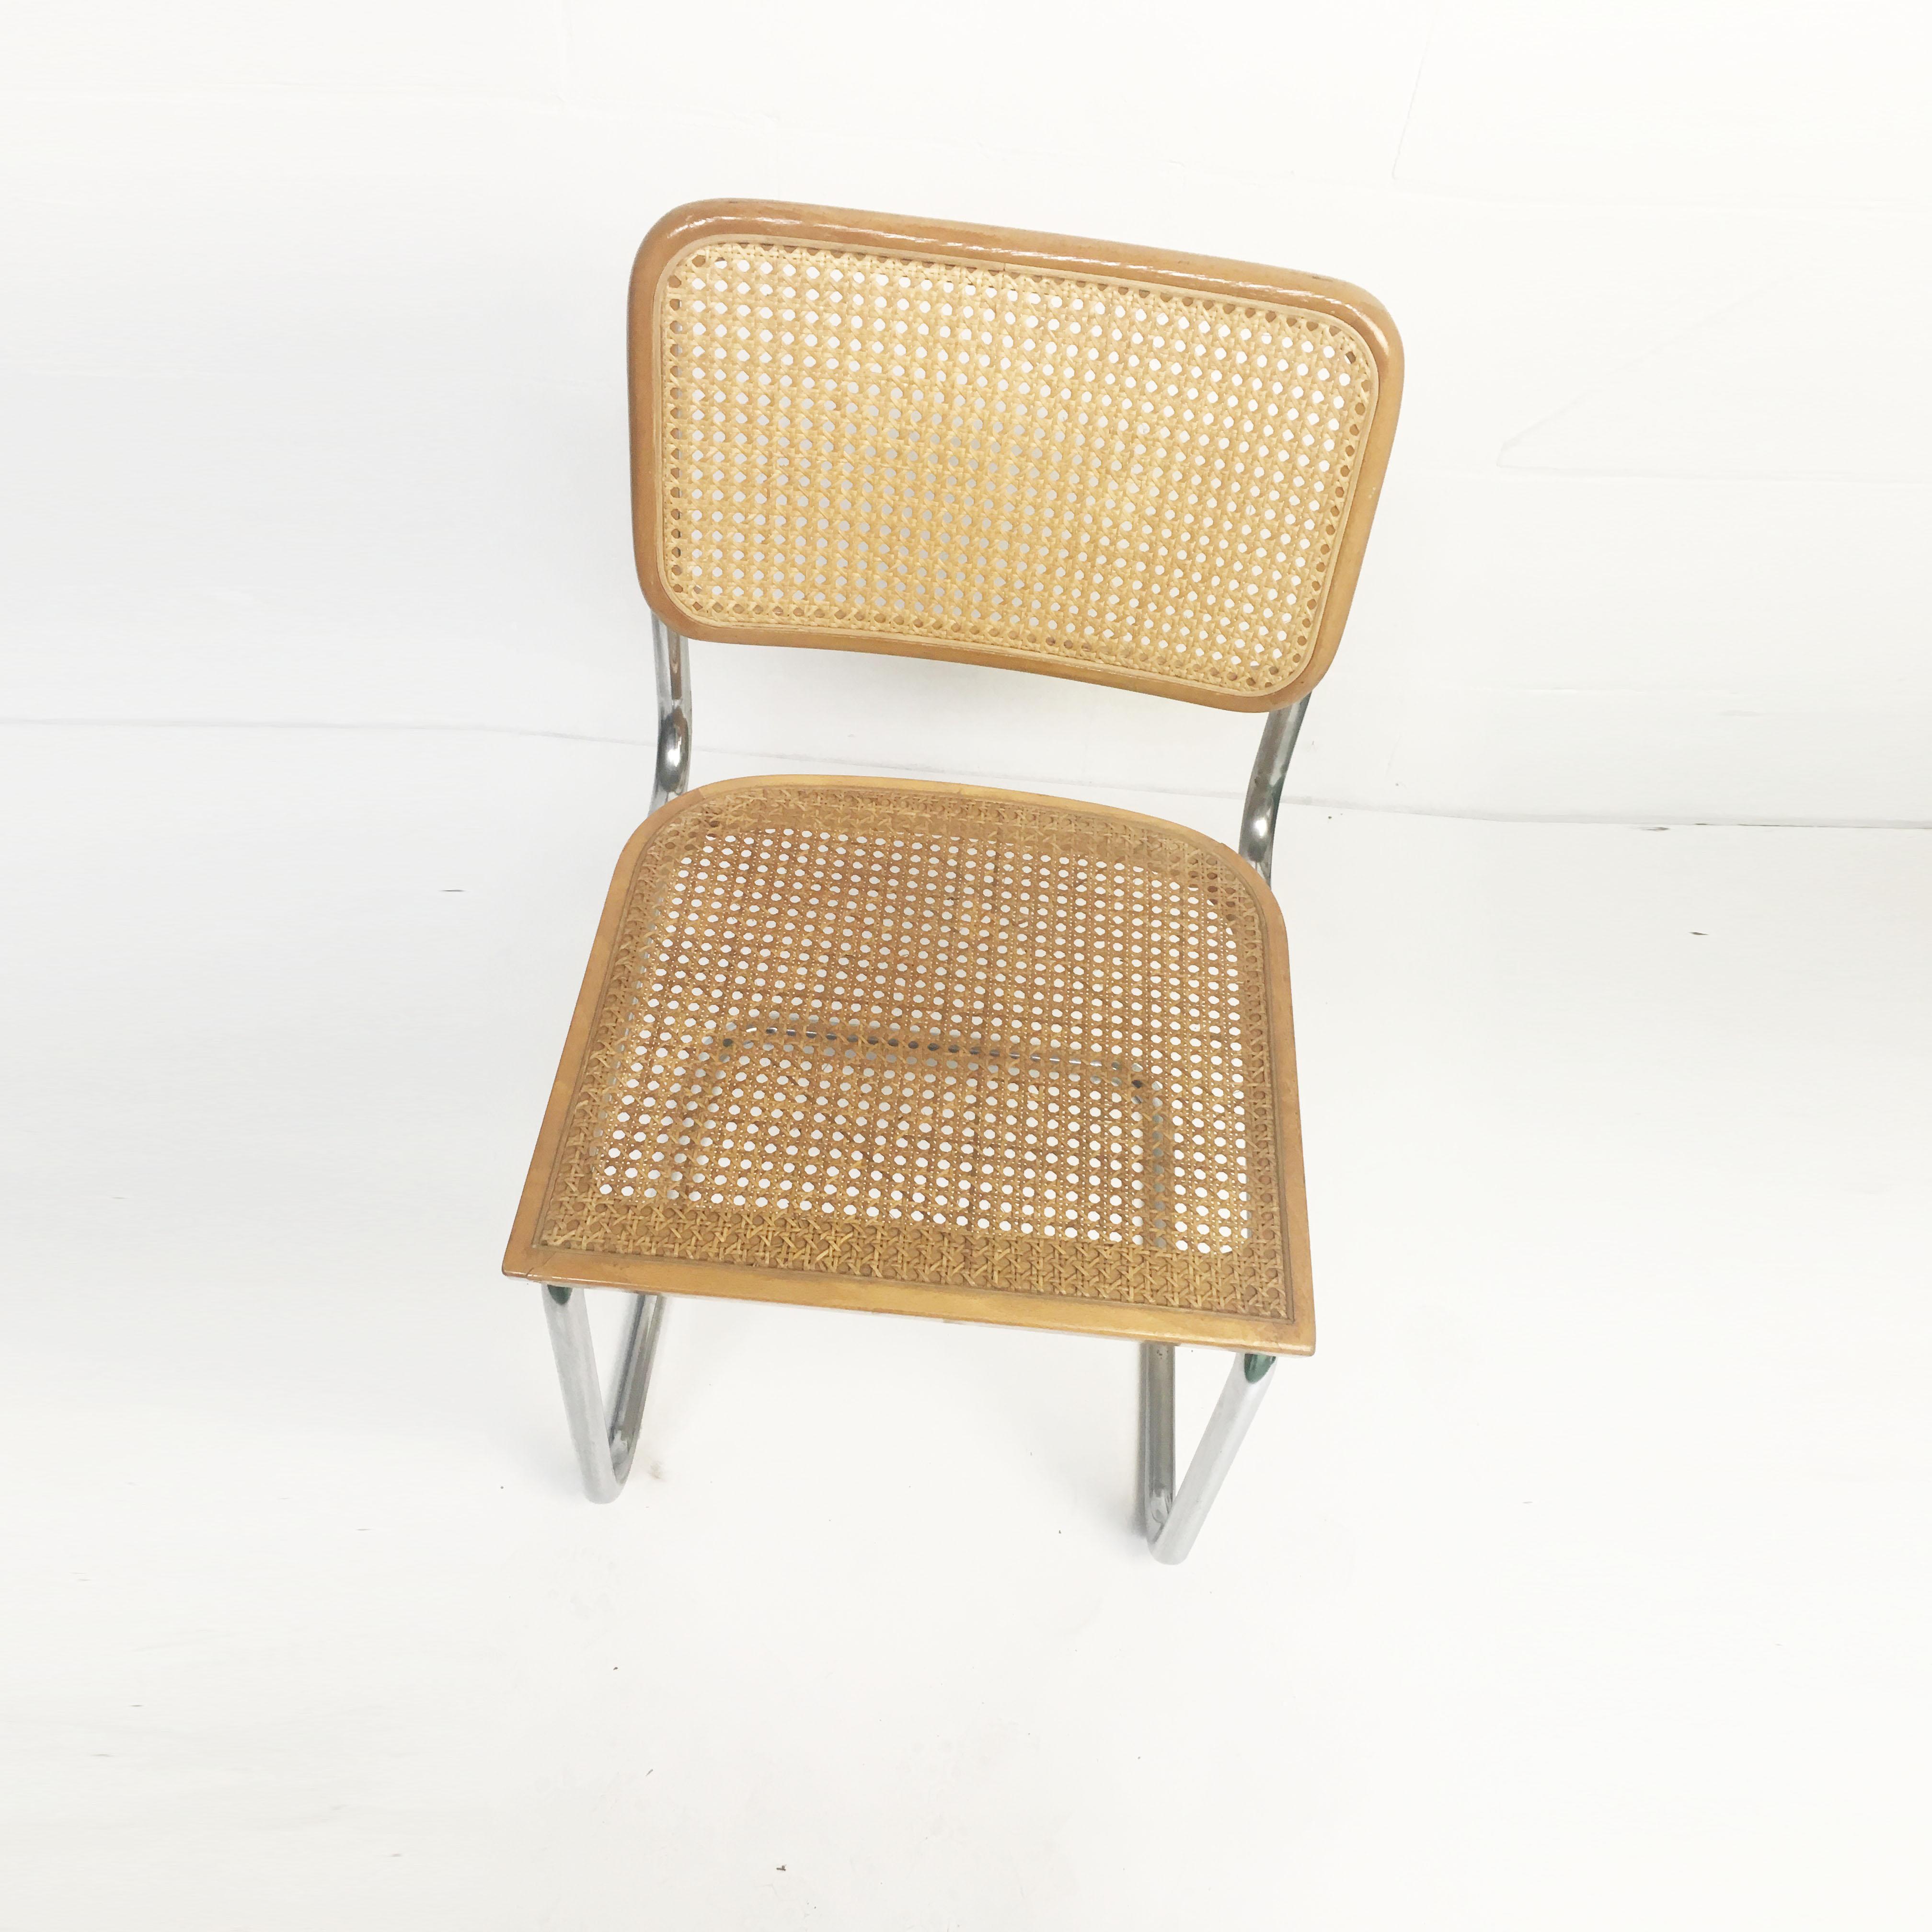 thonet s32 marcel breue bureau baantjer. Black Bedroom Furniture Sets. Home Design Ideas